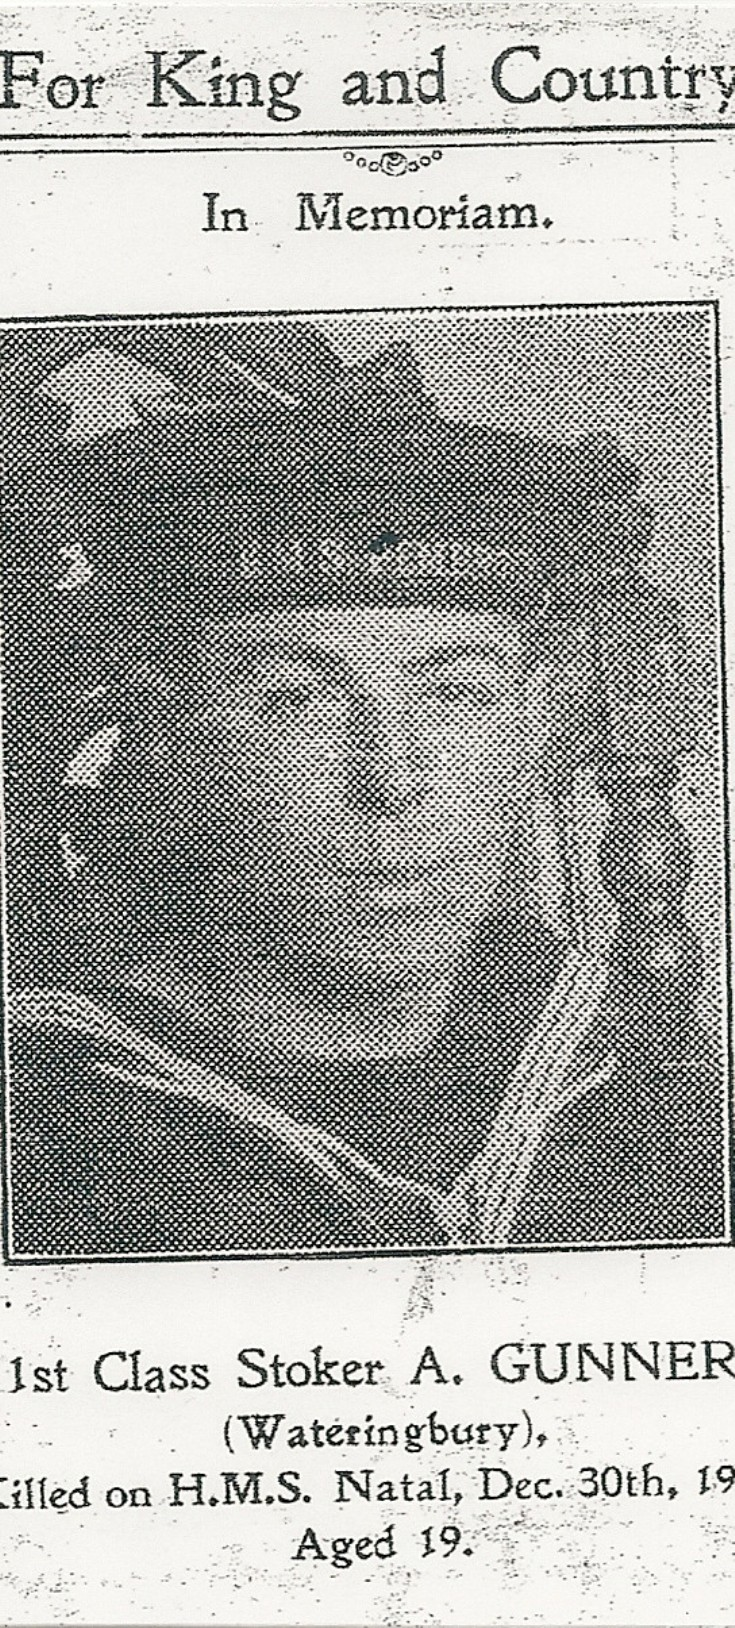 Alfred Gunner - 1st Class Stoker, HMS Natal